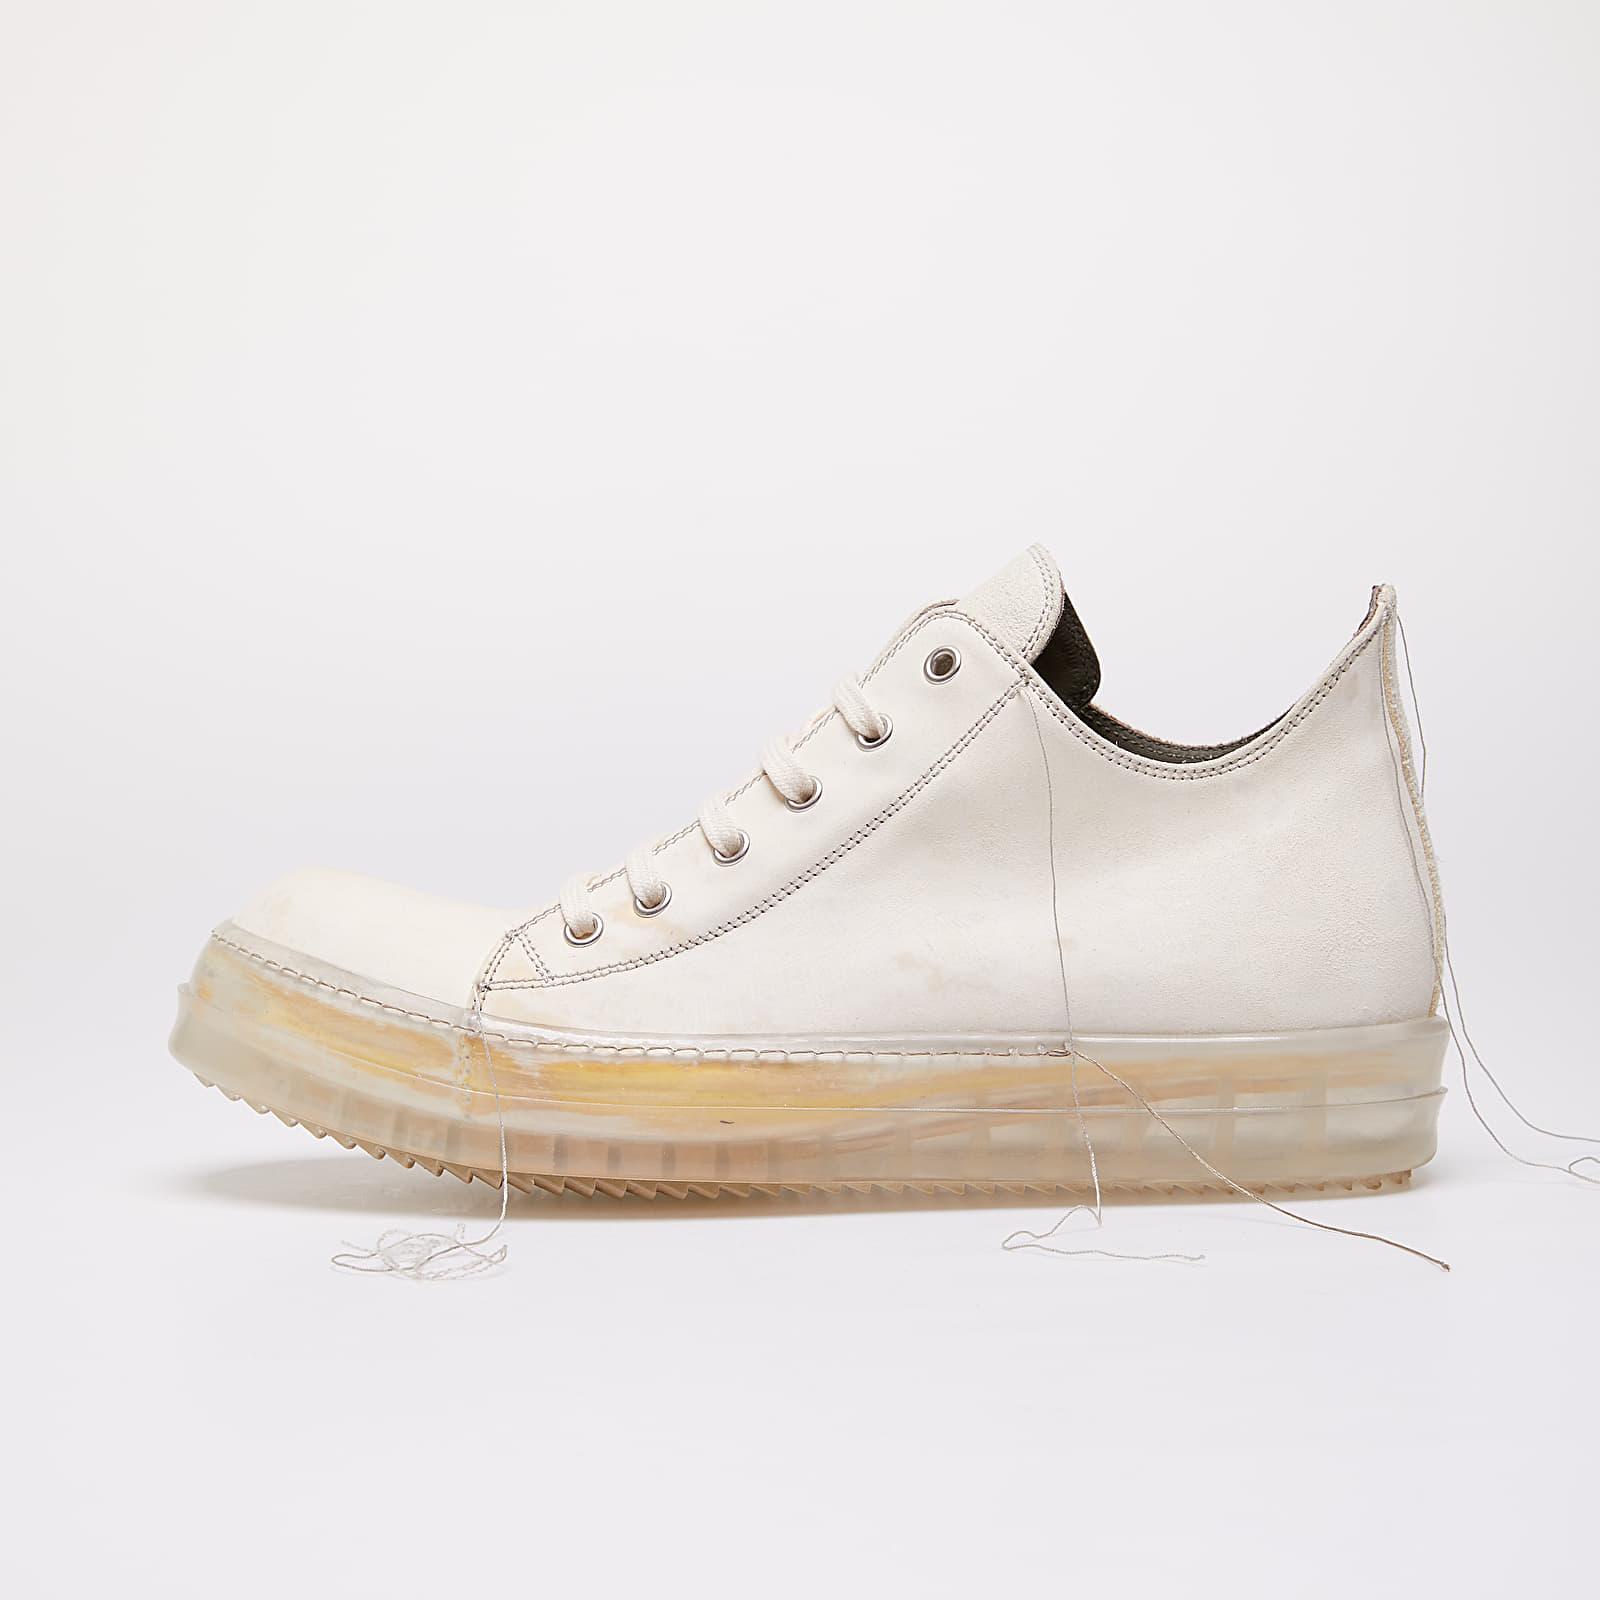 Rick Owens No Cap Low Sneakers